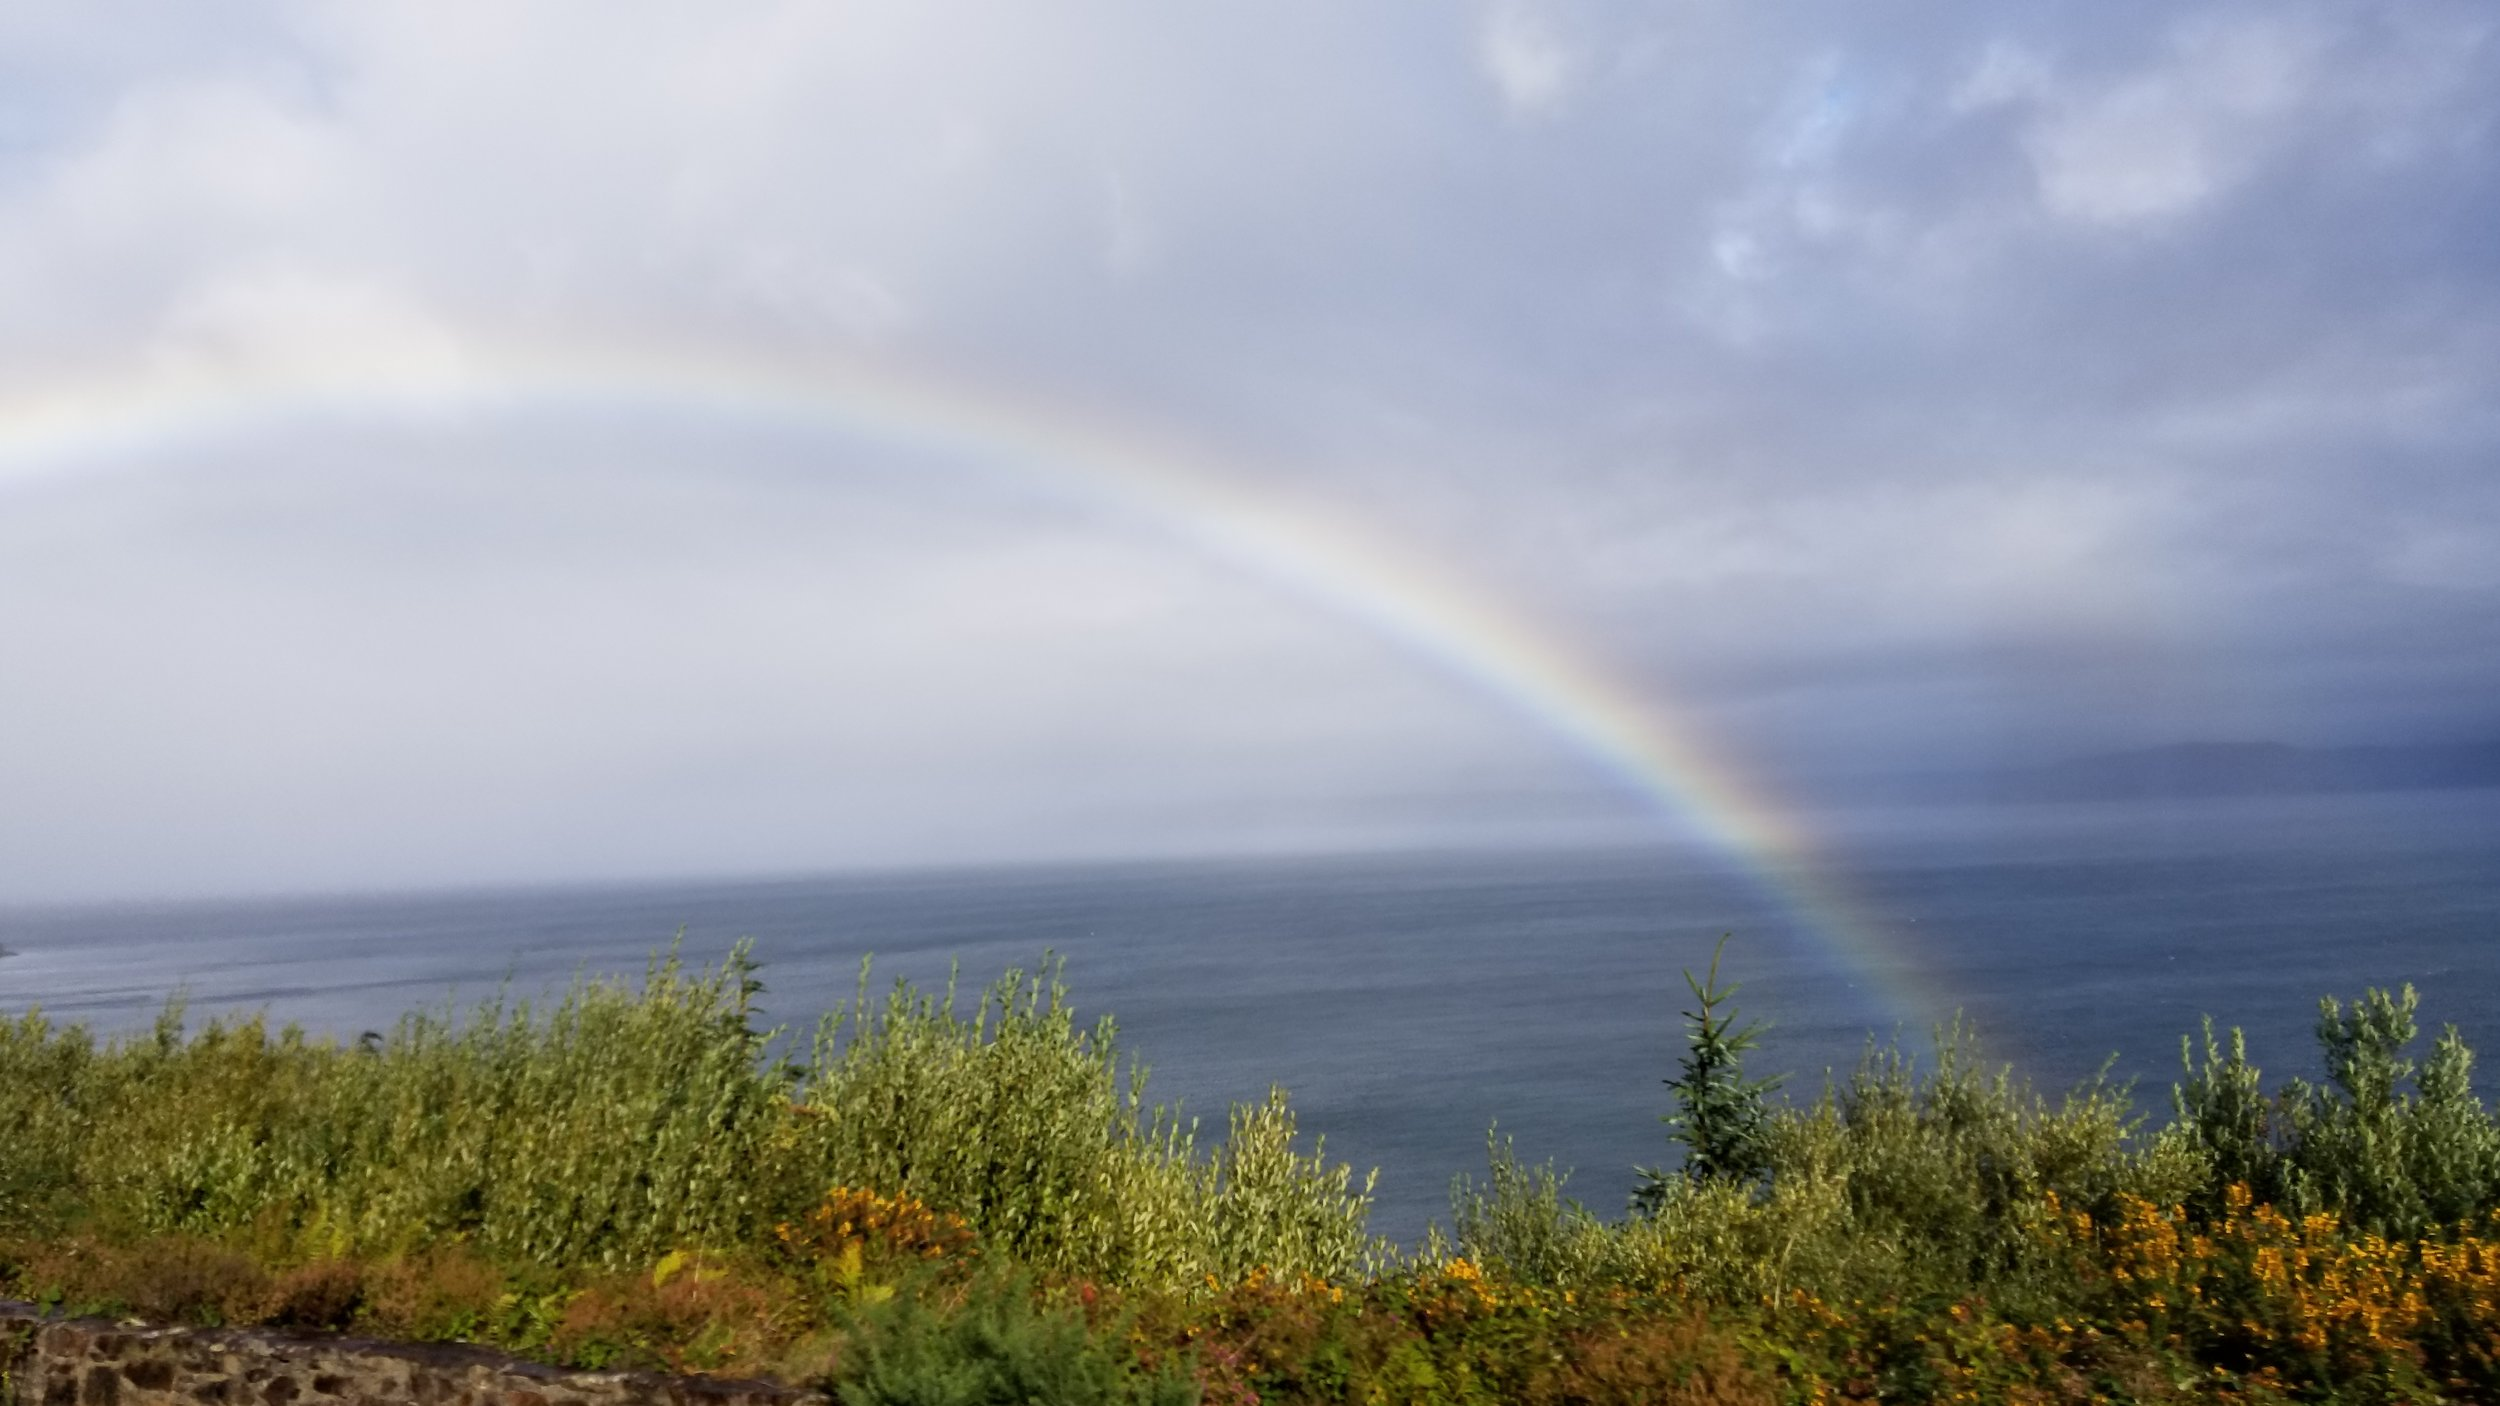 Rainbow along the coast of Ireland, 2018, Karmal Spaeth